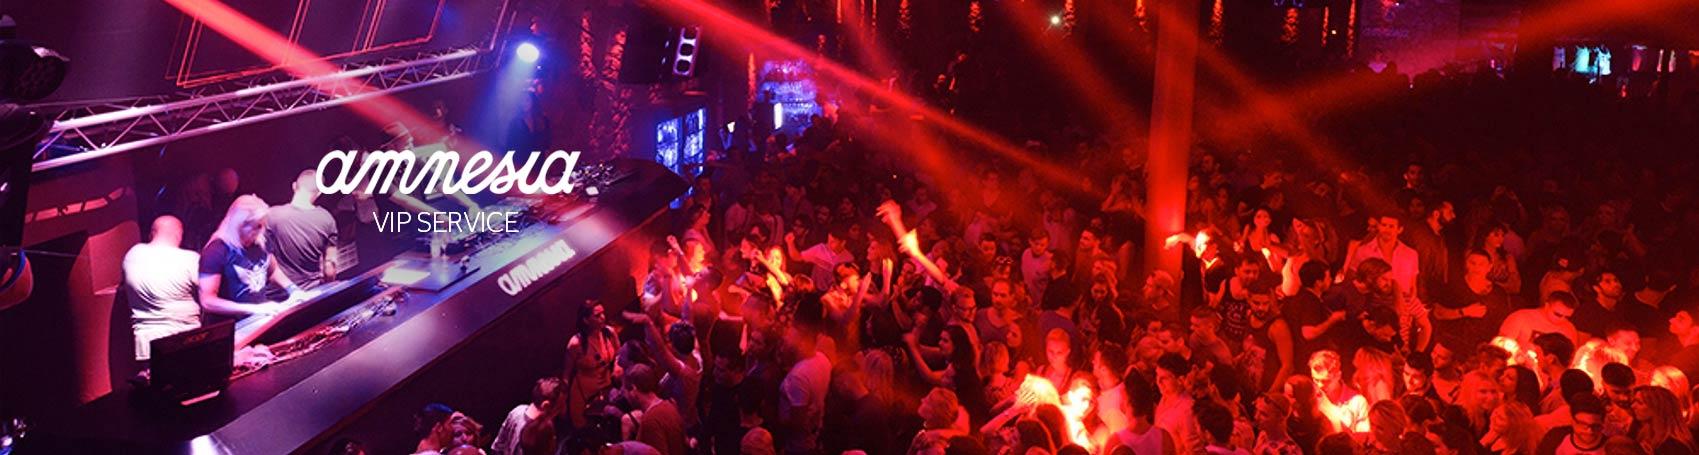 Table booking service nightclub Amnesia VIP in Ibiza. VIP services Ibiza. Consulting Services Ibiza